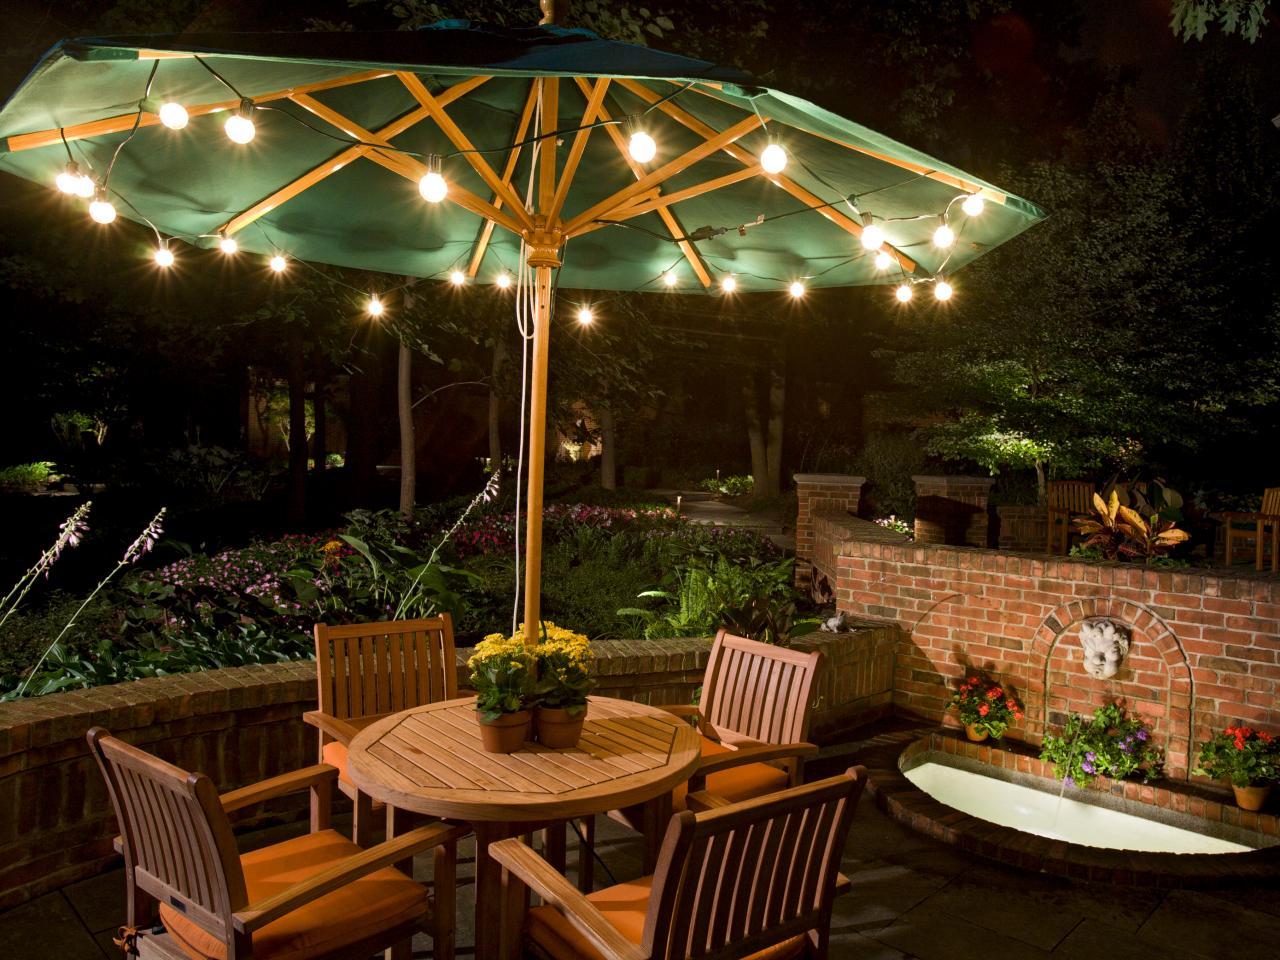 lighting for backyard photo - 2